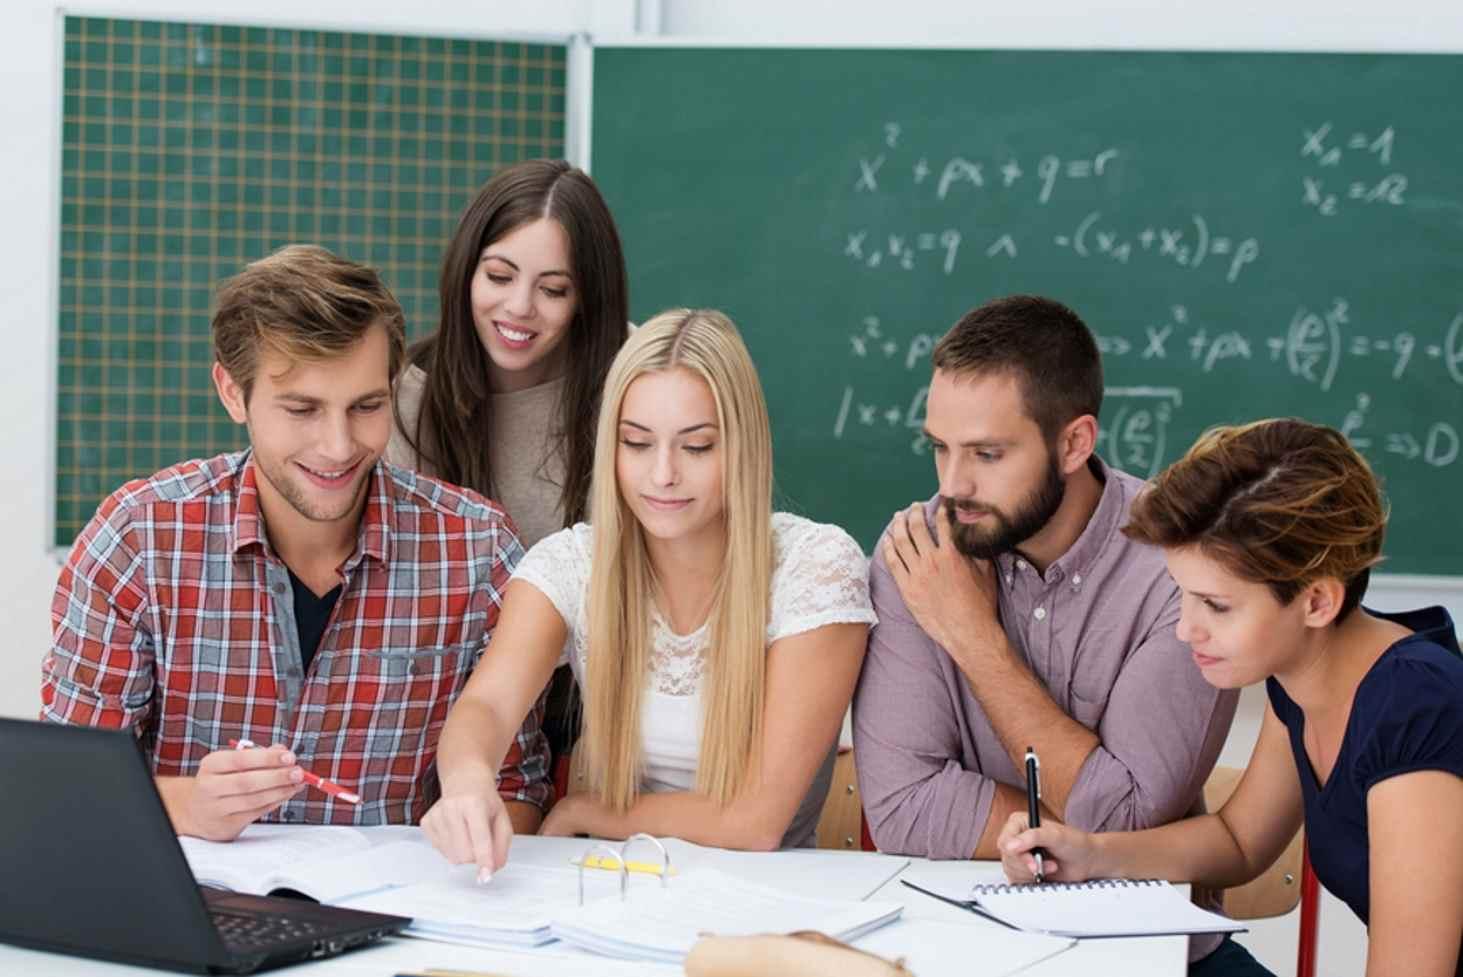 kak-pedagogu-sekonomit-na-kursah-povysheniya-kvalifikatsii